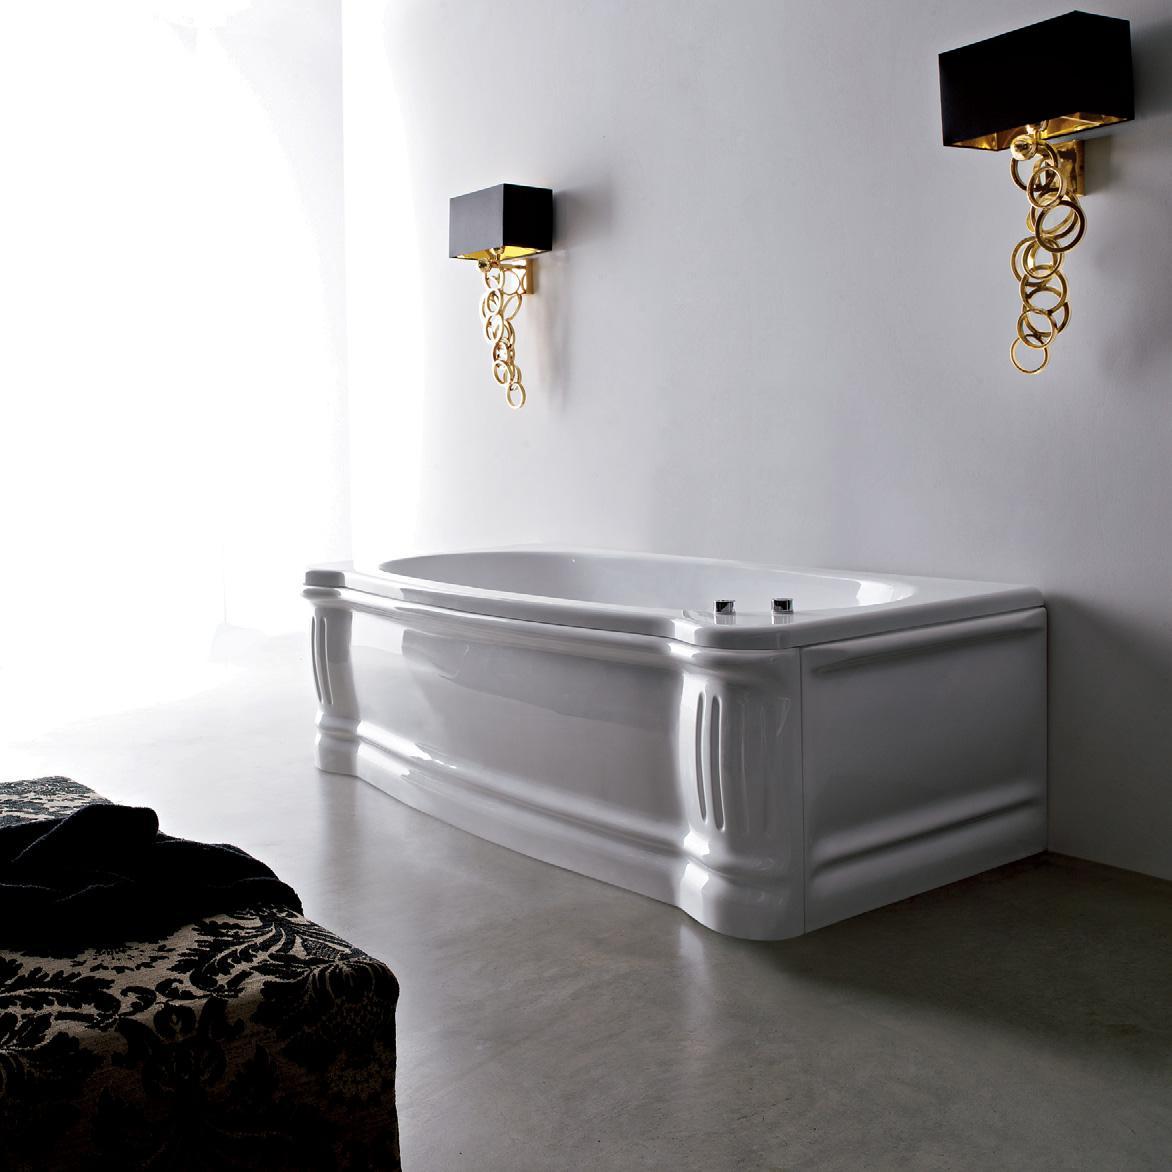 Чугунная ванна с декоративными панелями